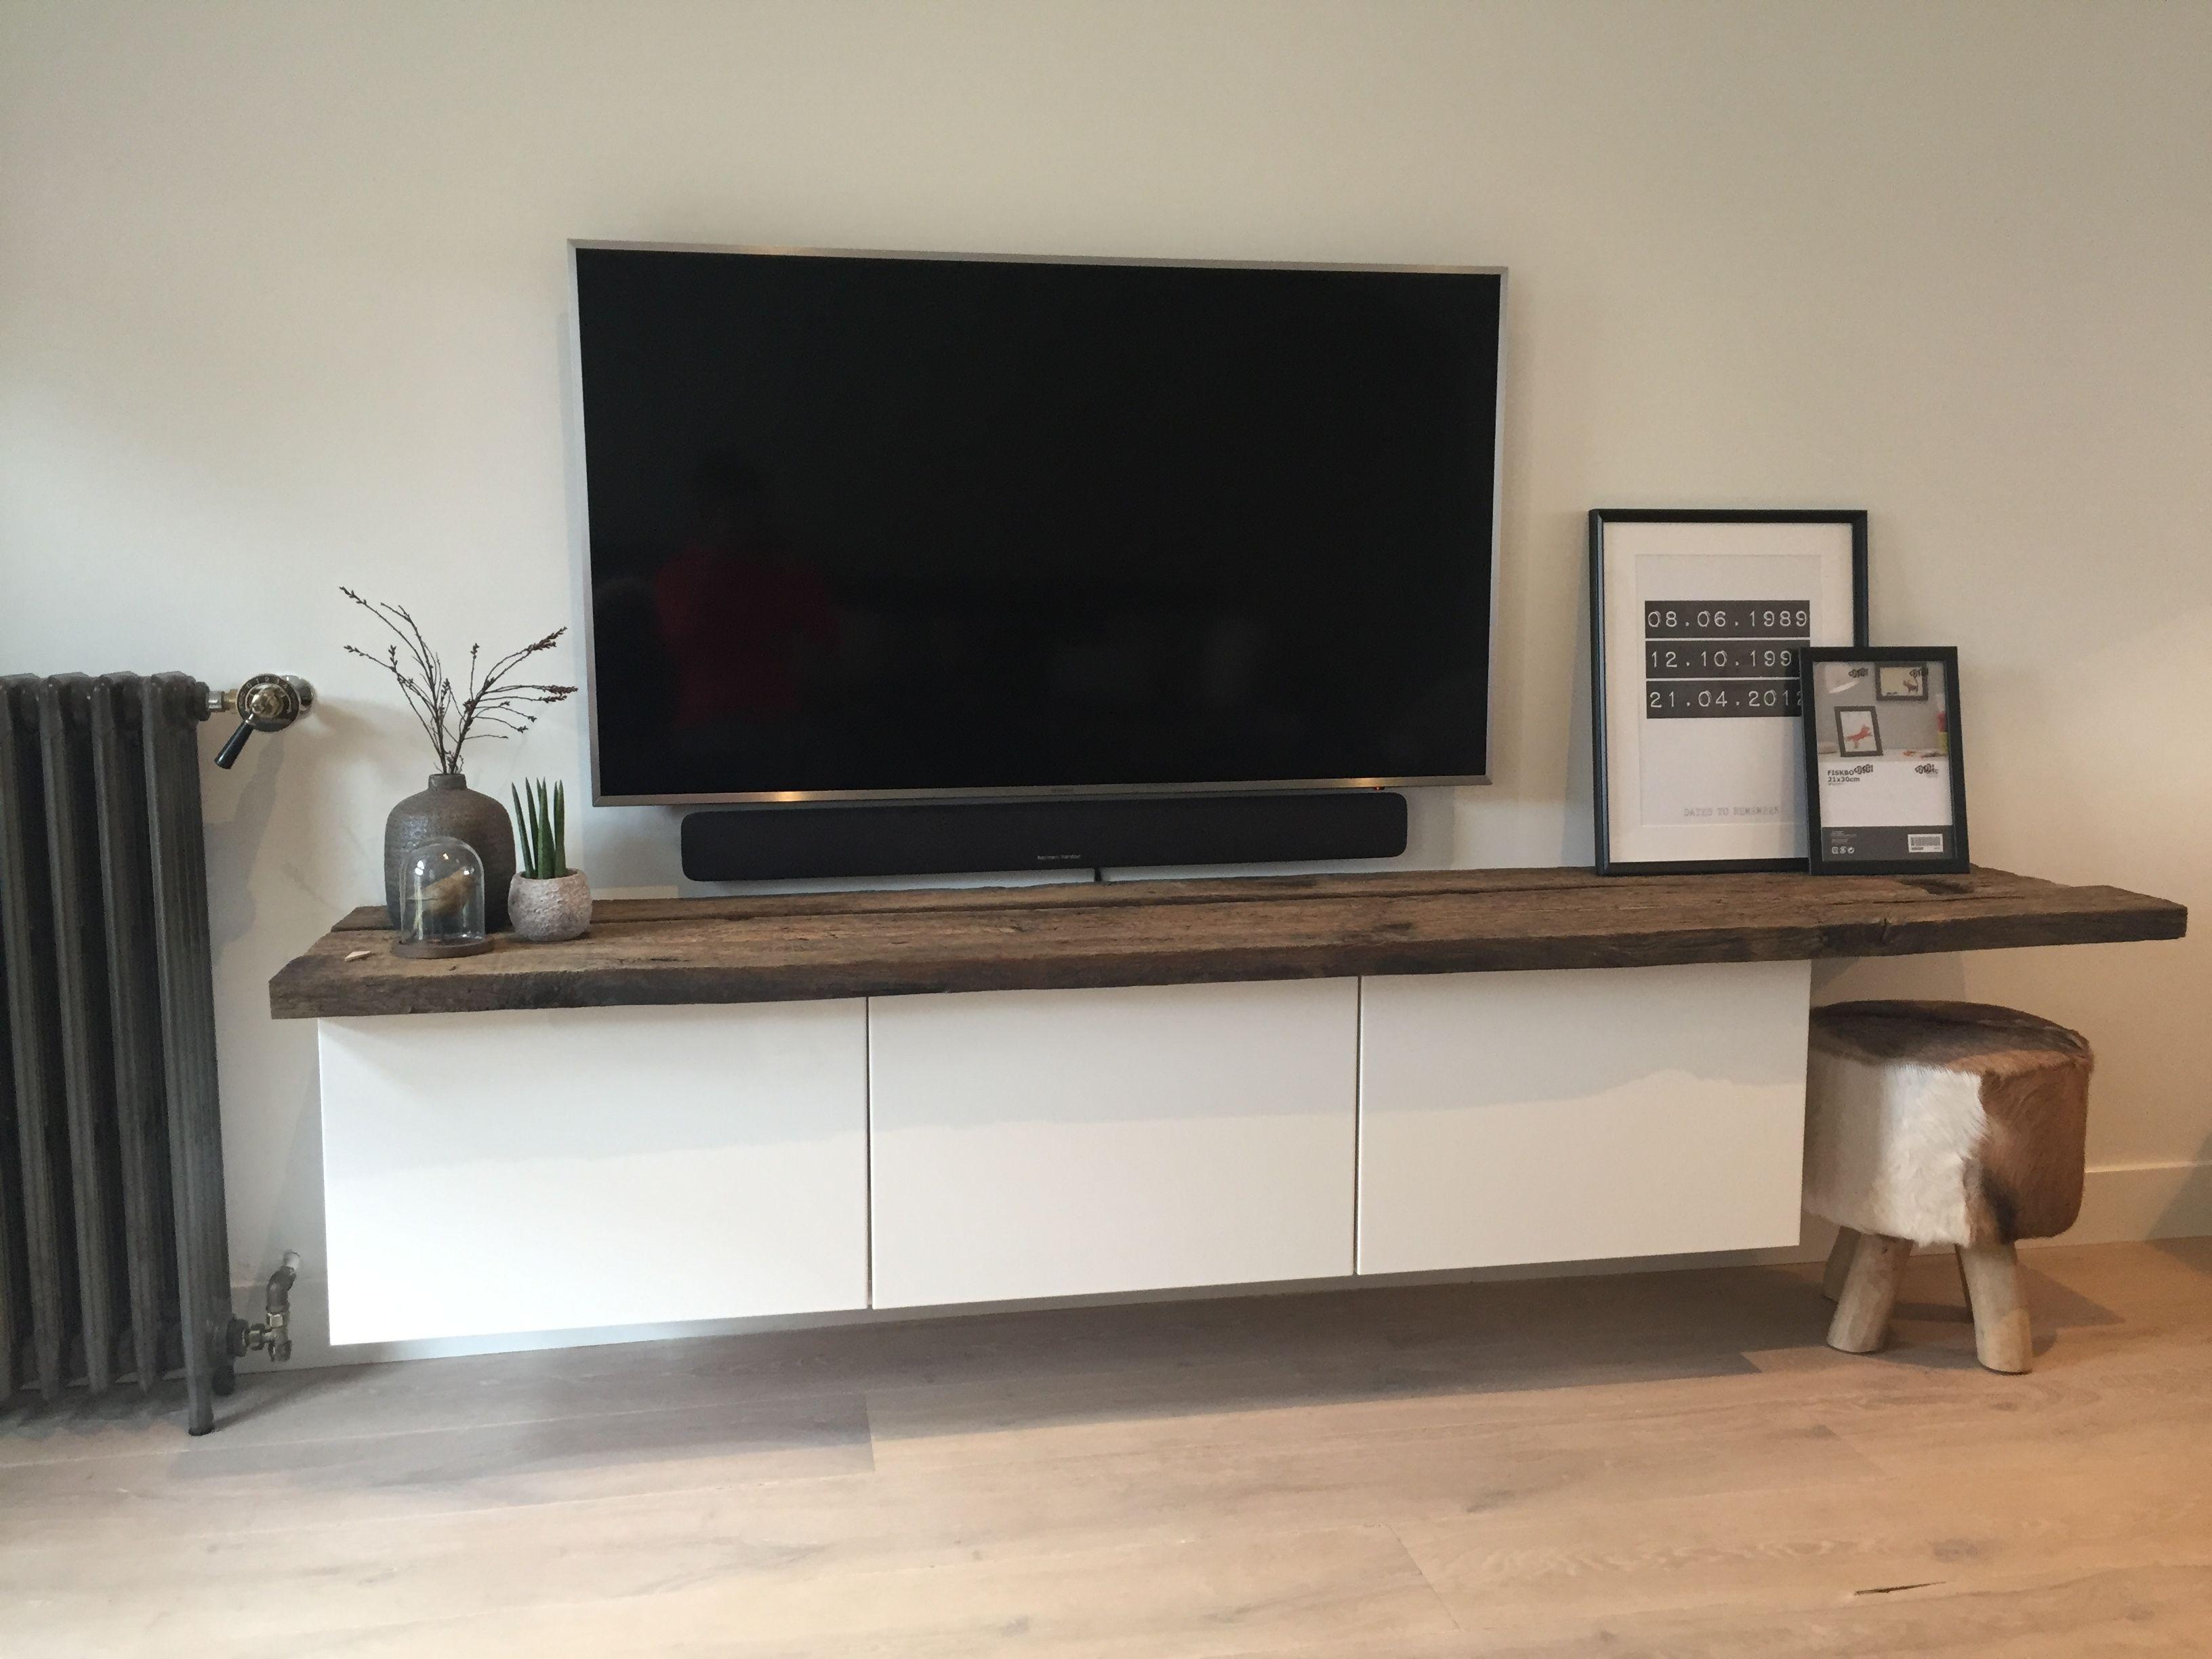 Ideeen Tv Meubel.Tv Meubel Unites Tv Meubels Tv Meubels En Ikea Woonkamer